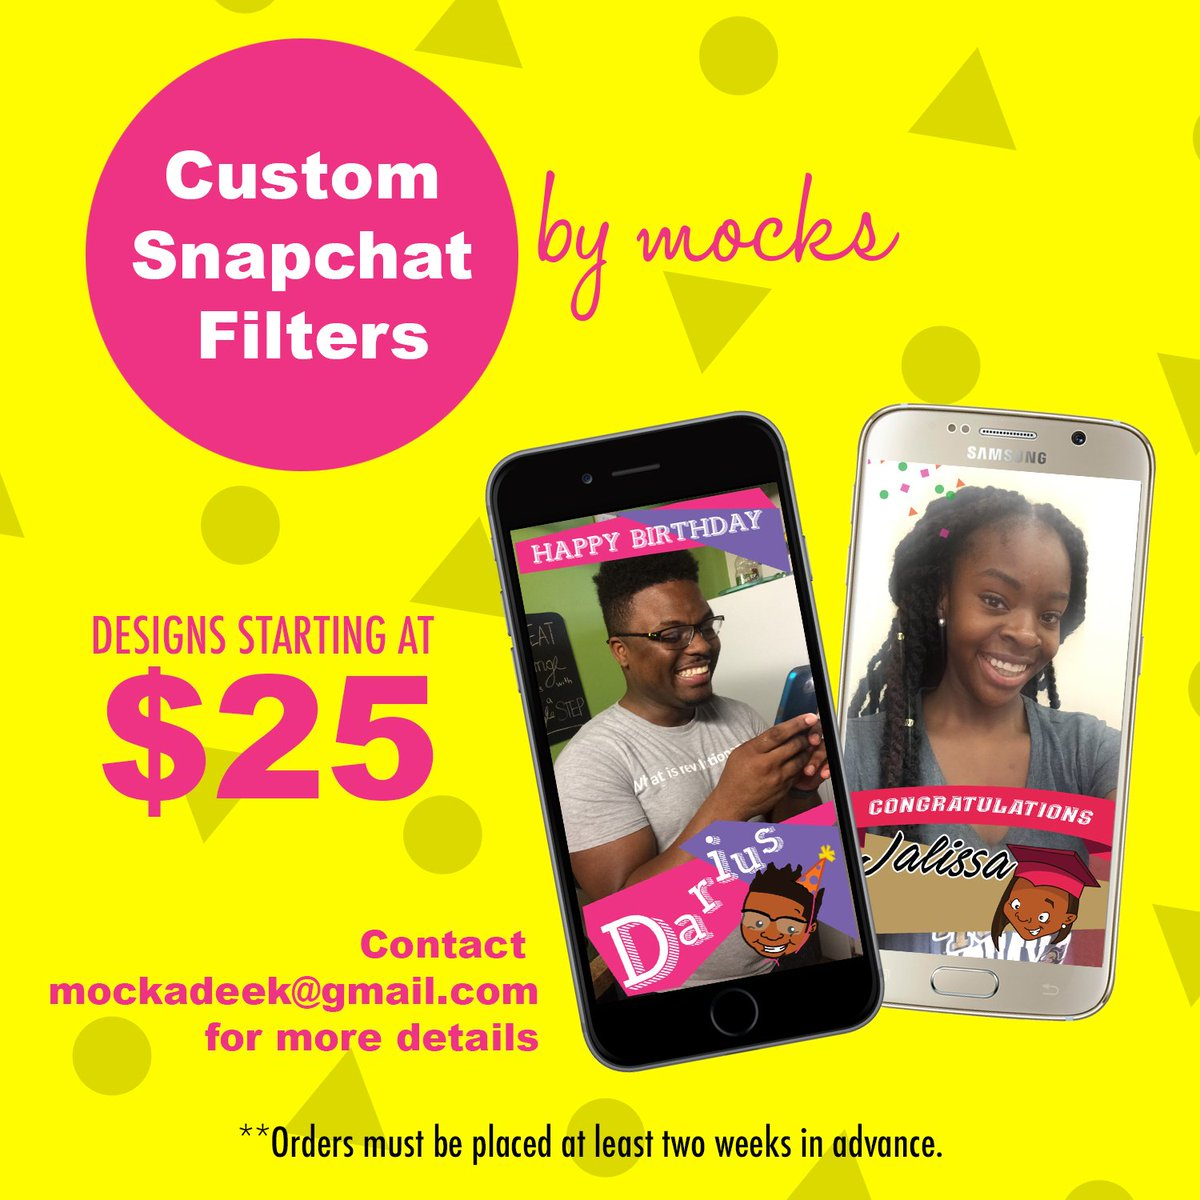 In case you forgot... Custom Snapchat Filters!! https://t.co/lGujVMf4jj